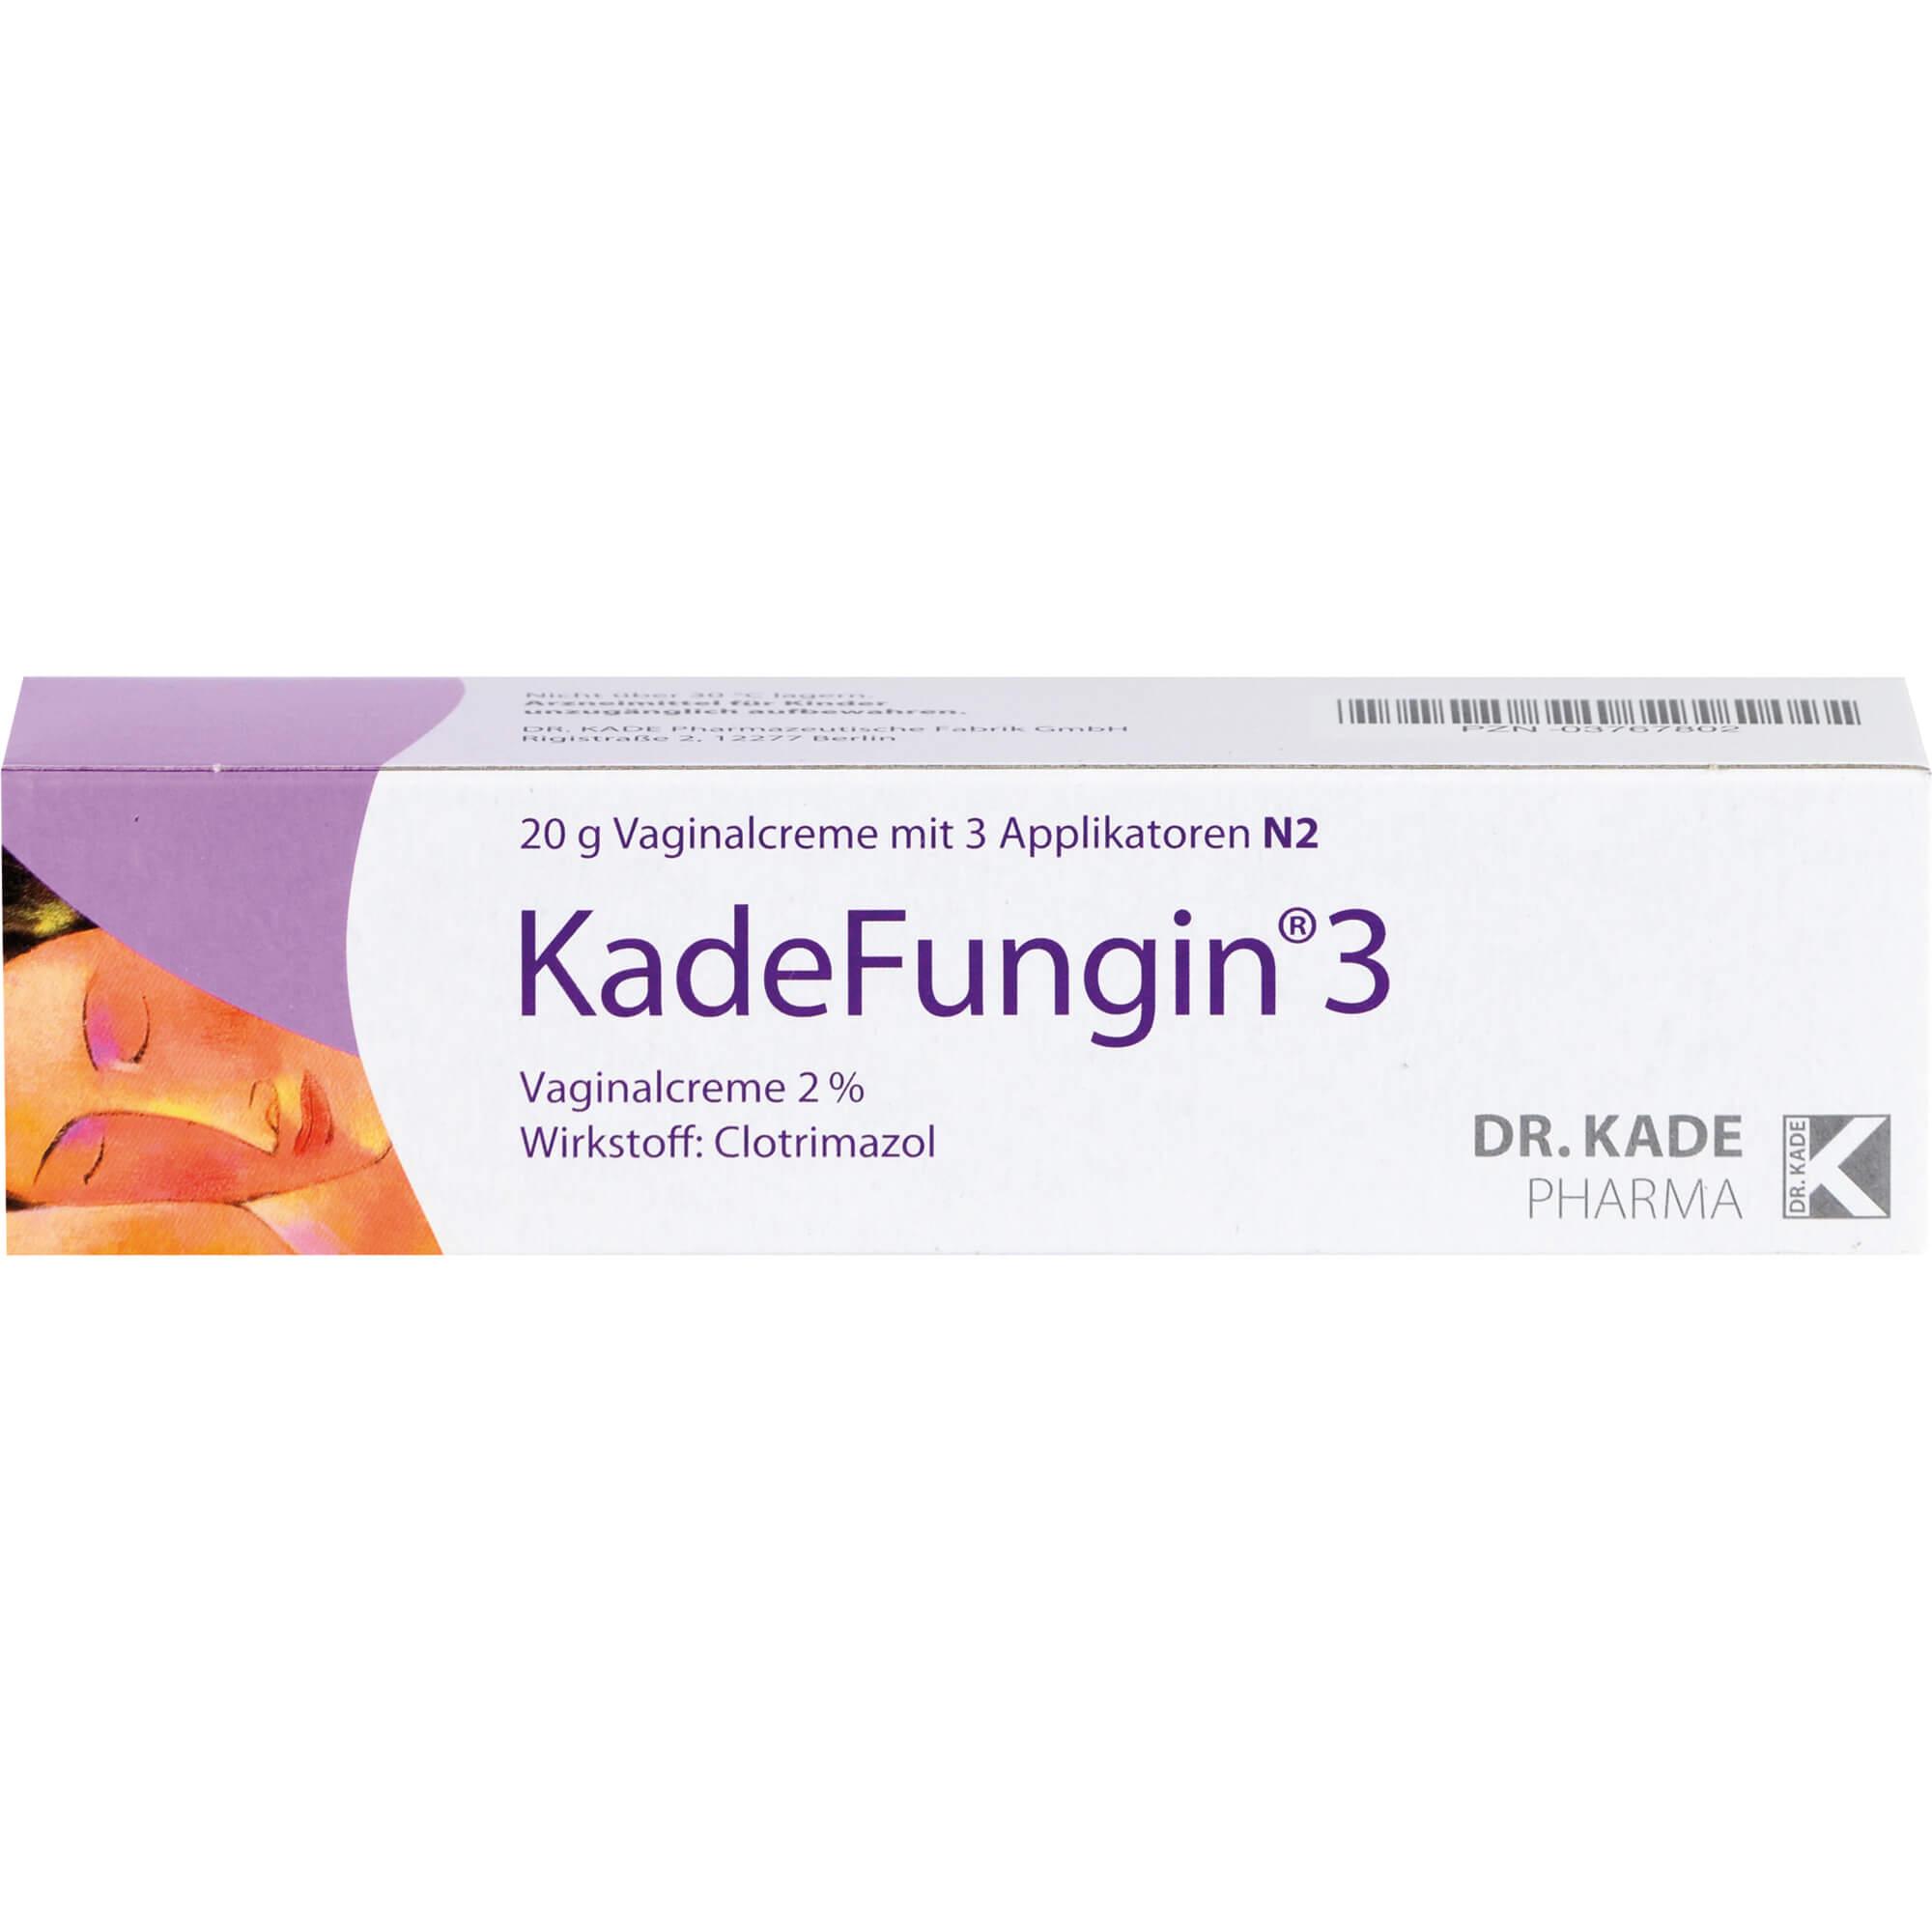 KADEFUNGIN 3 Vaginalcreme